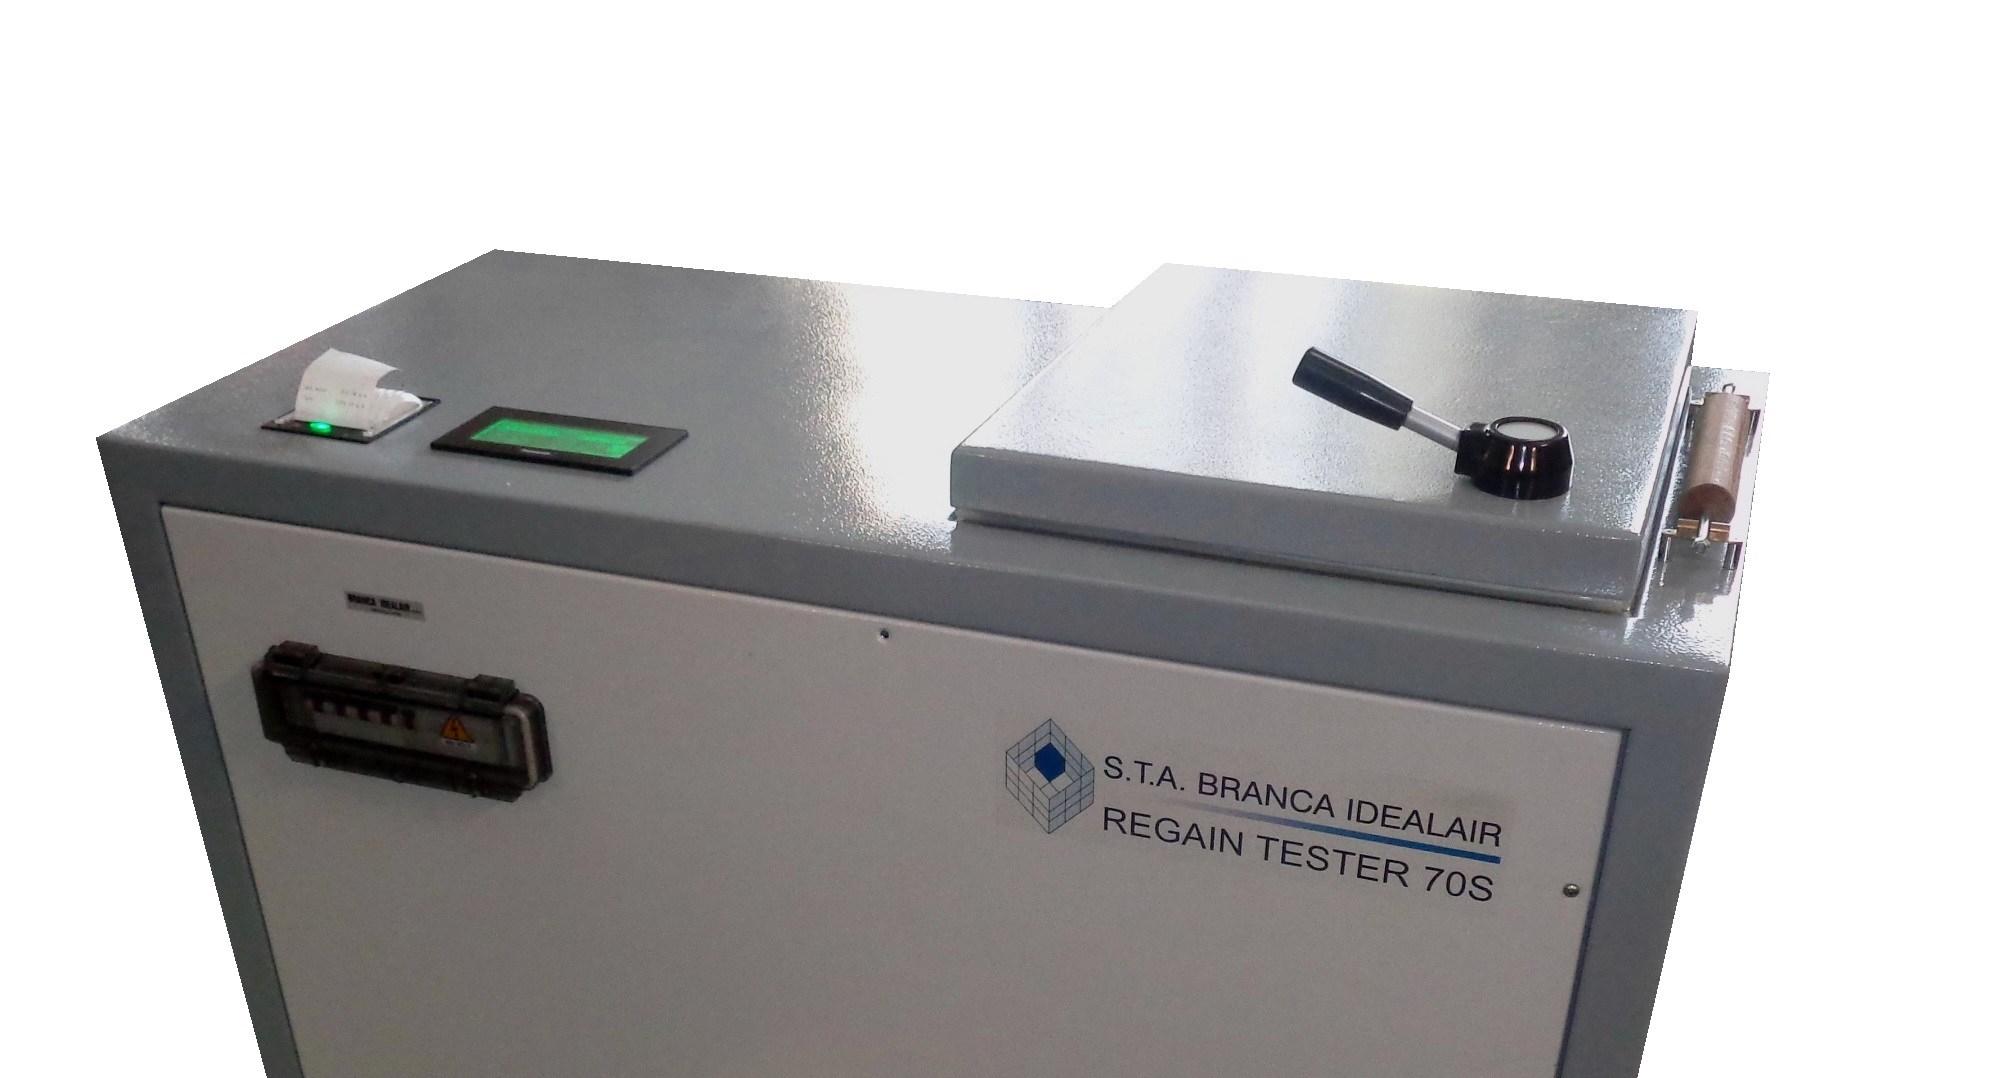 fibers-rapid-drying-oven